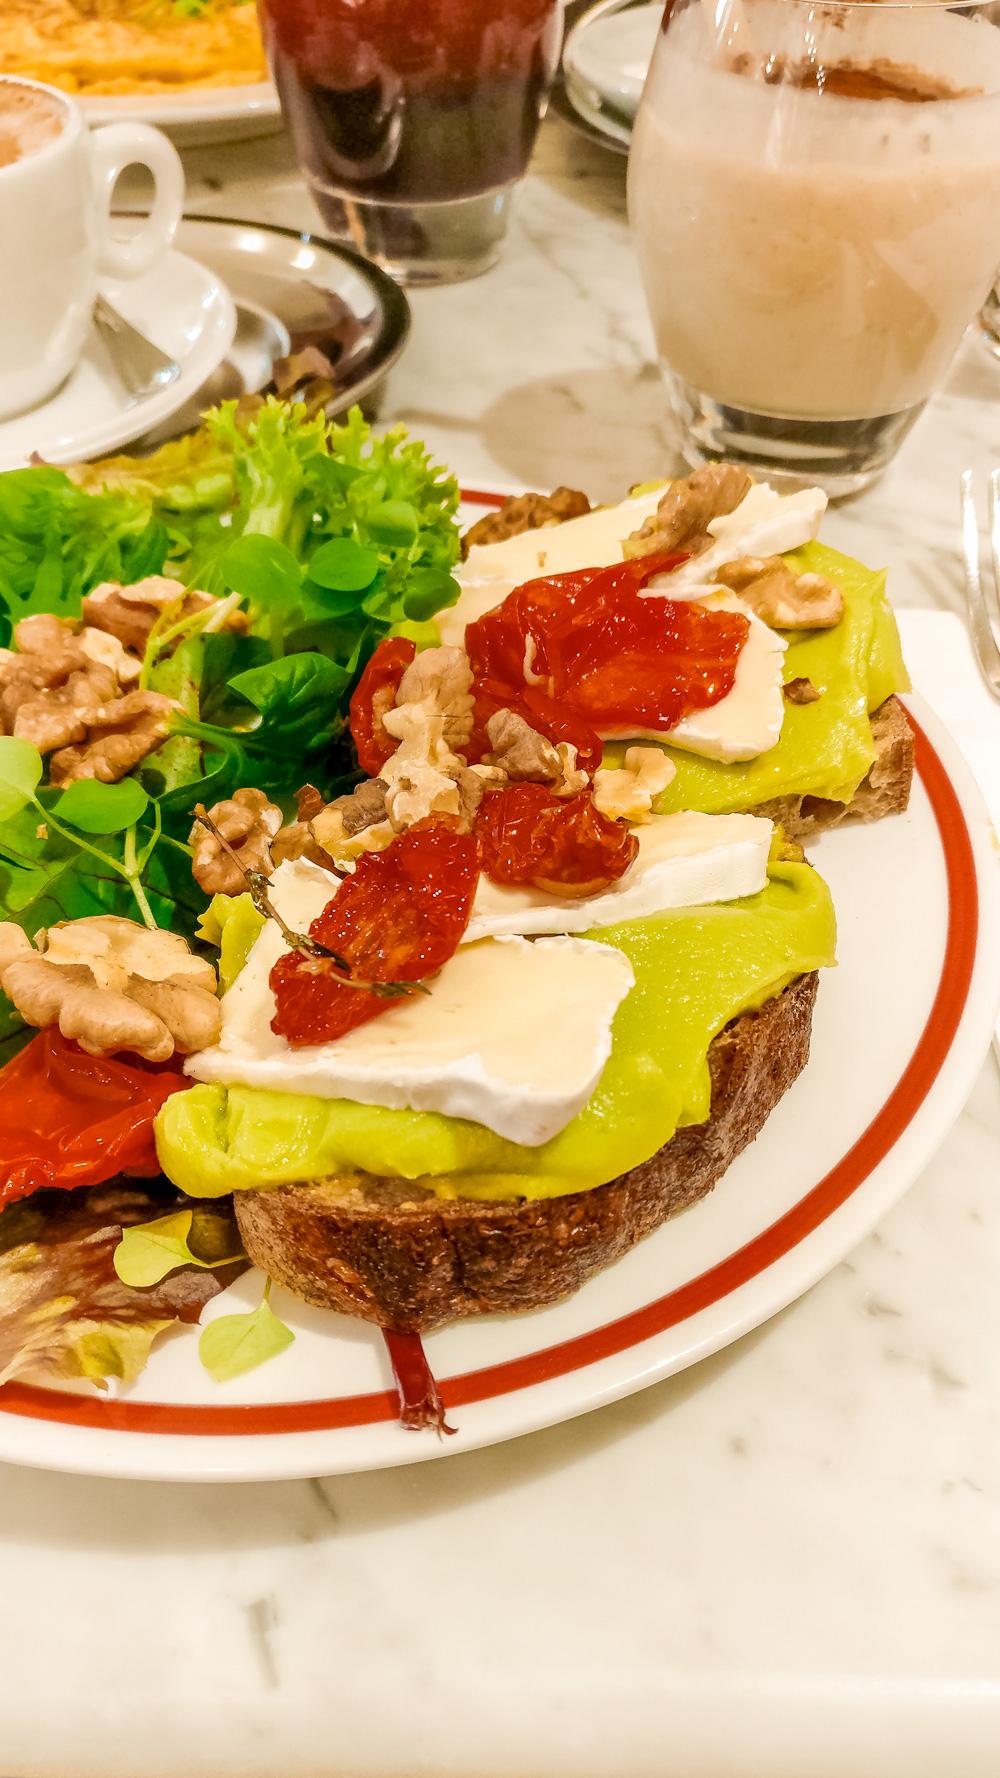 Avocado toast at Börze Café and Restaurant - Budapest's best breakfast & brunch places close to the Parliament | Aliz's Wonderland